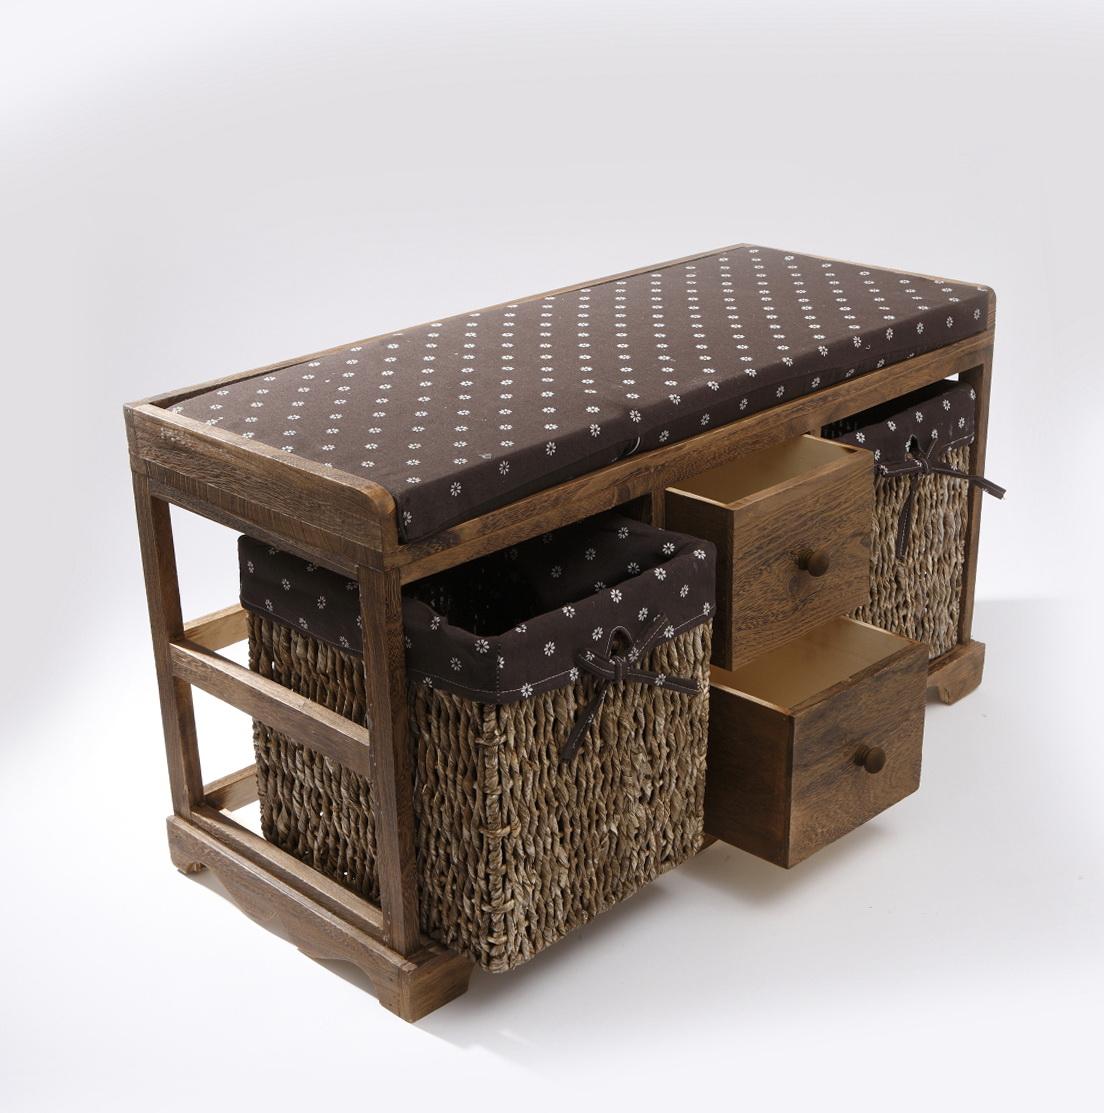 Wooden Storage Bench With Baskets